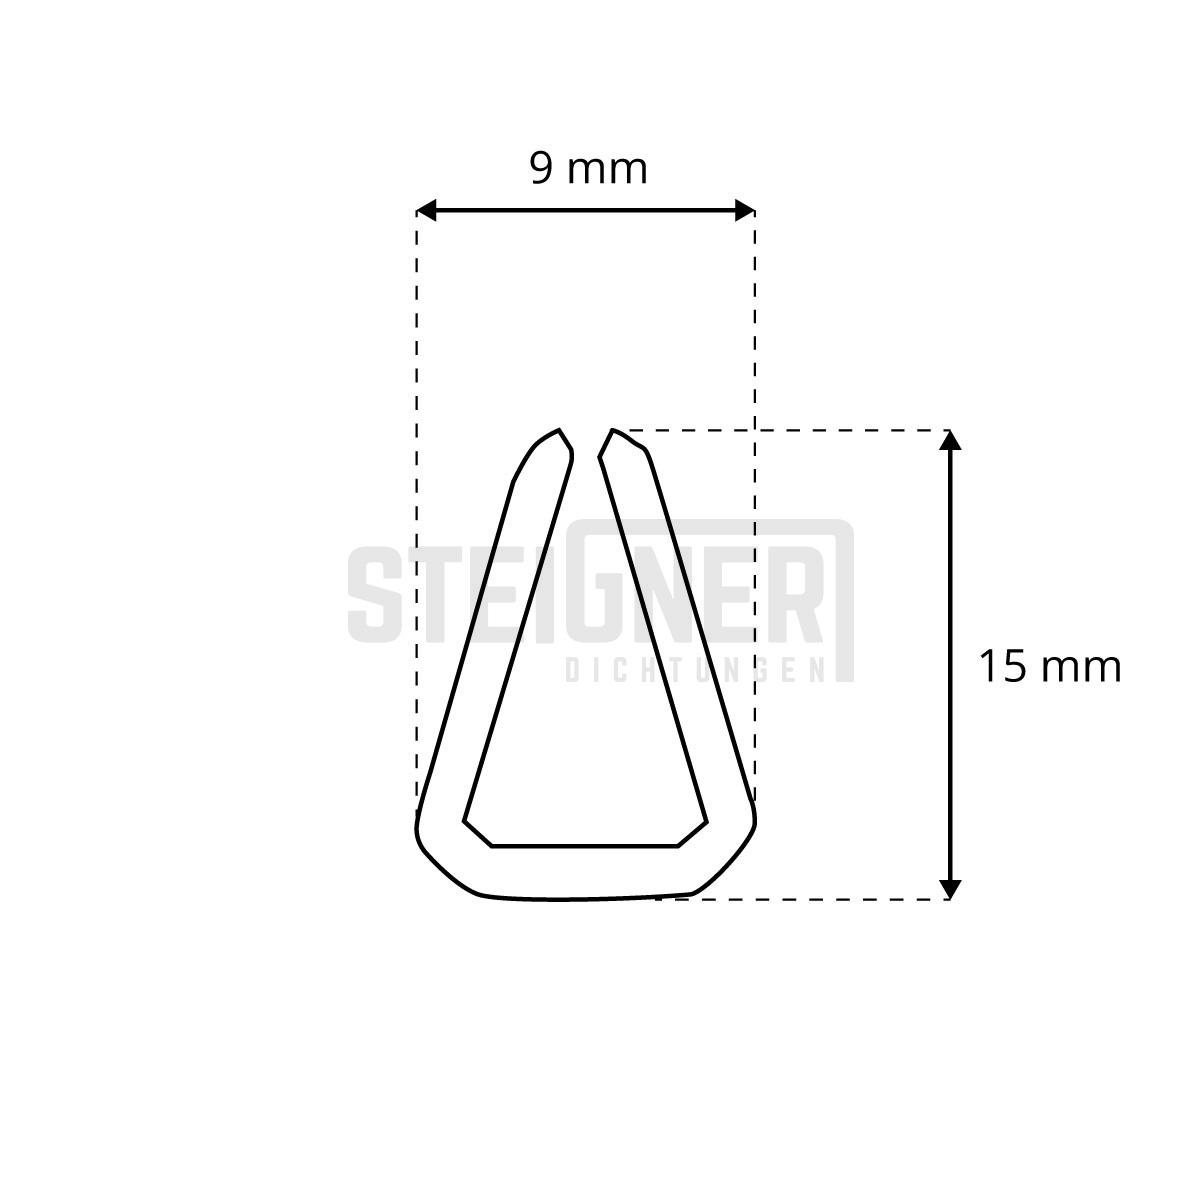 Gummidichtung-Kantenschutz-Kederband-Kofferraumdichtung-Tuerdichtung-Keder